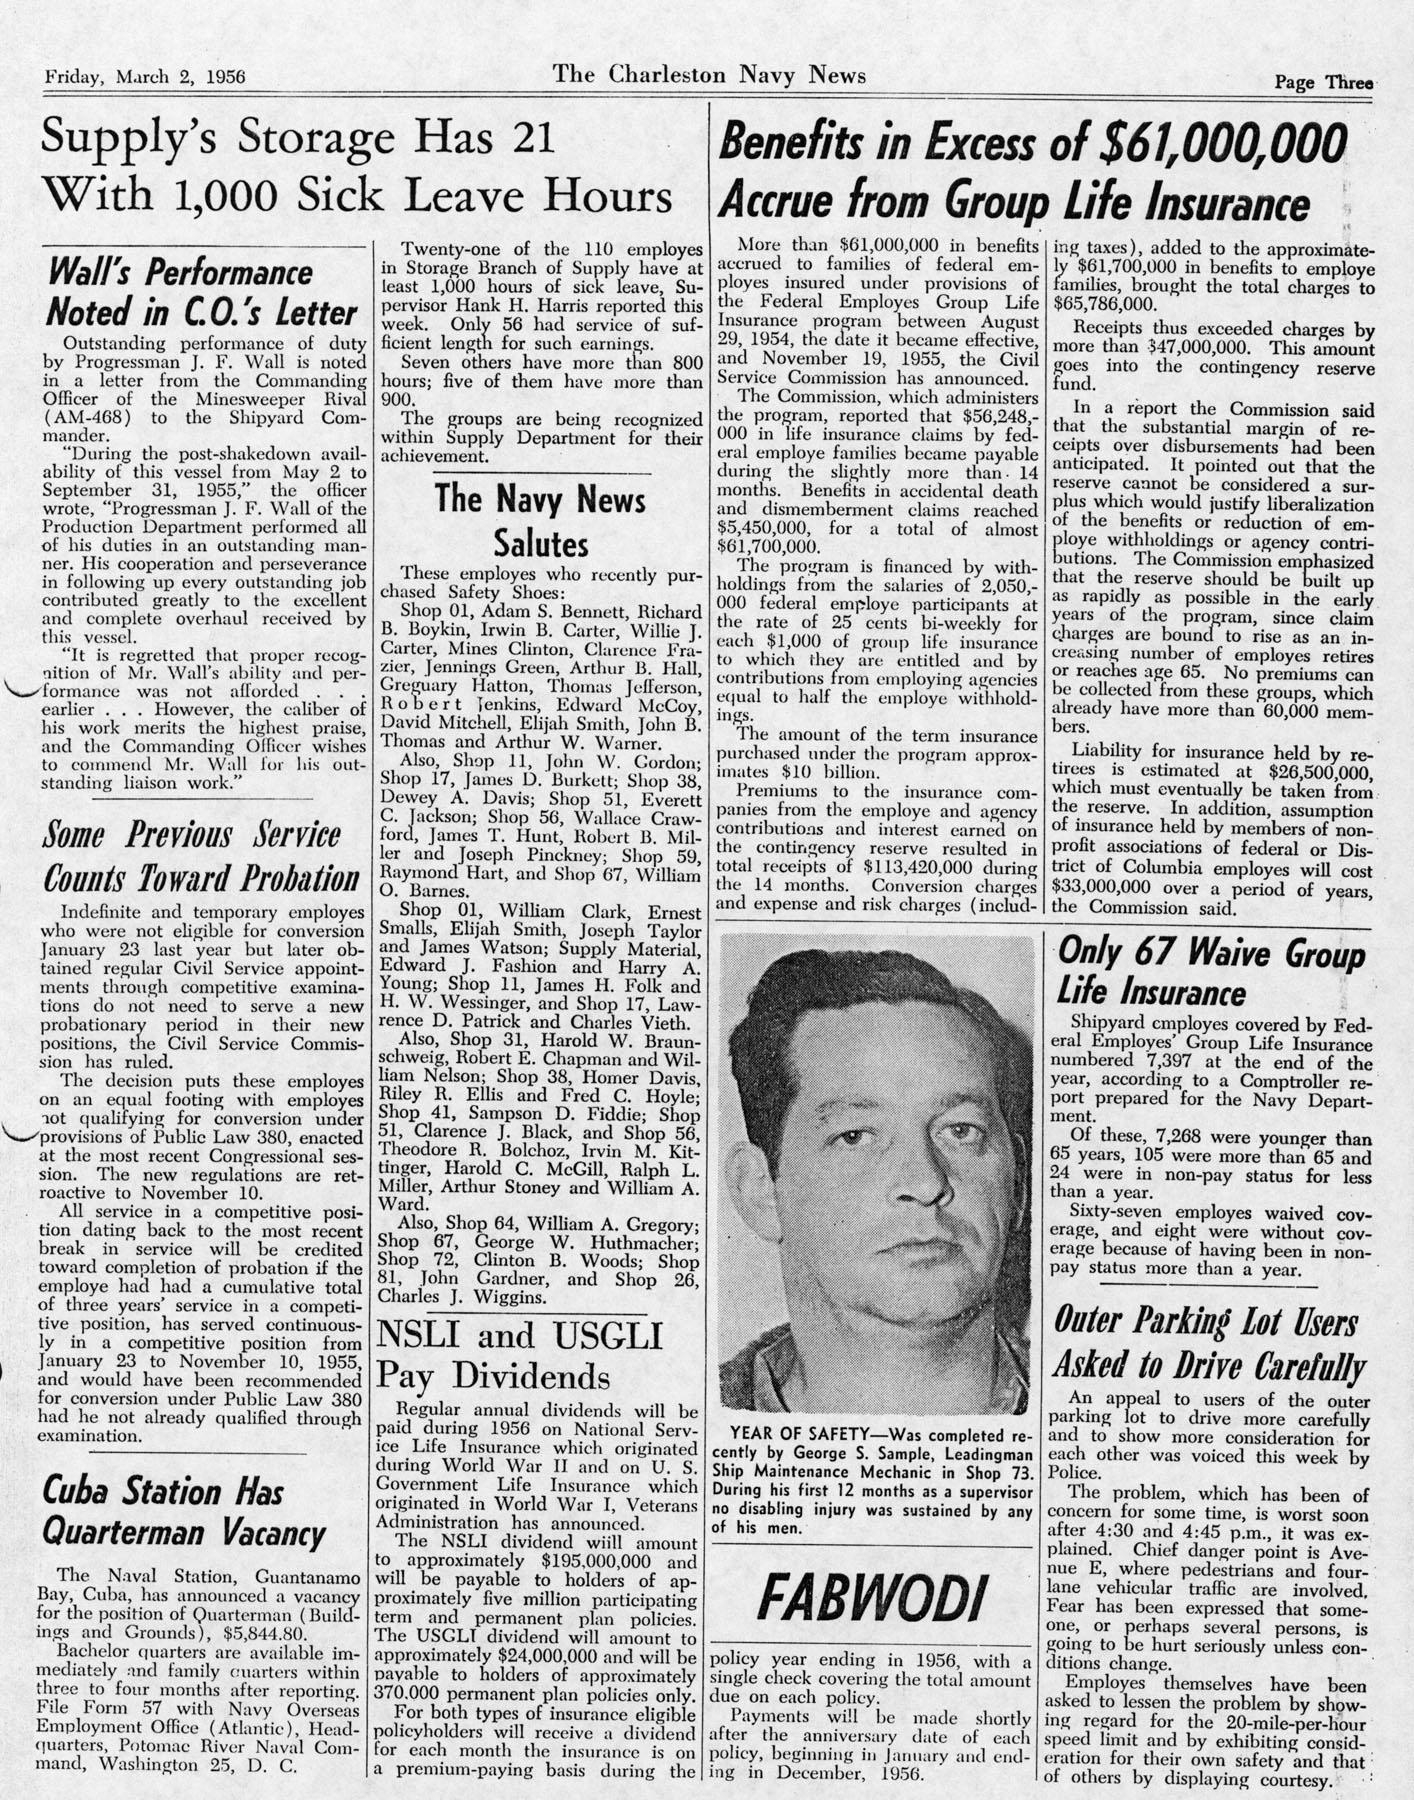 The Charleston Navy News, Volume 14, Edition 16, page iii